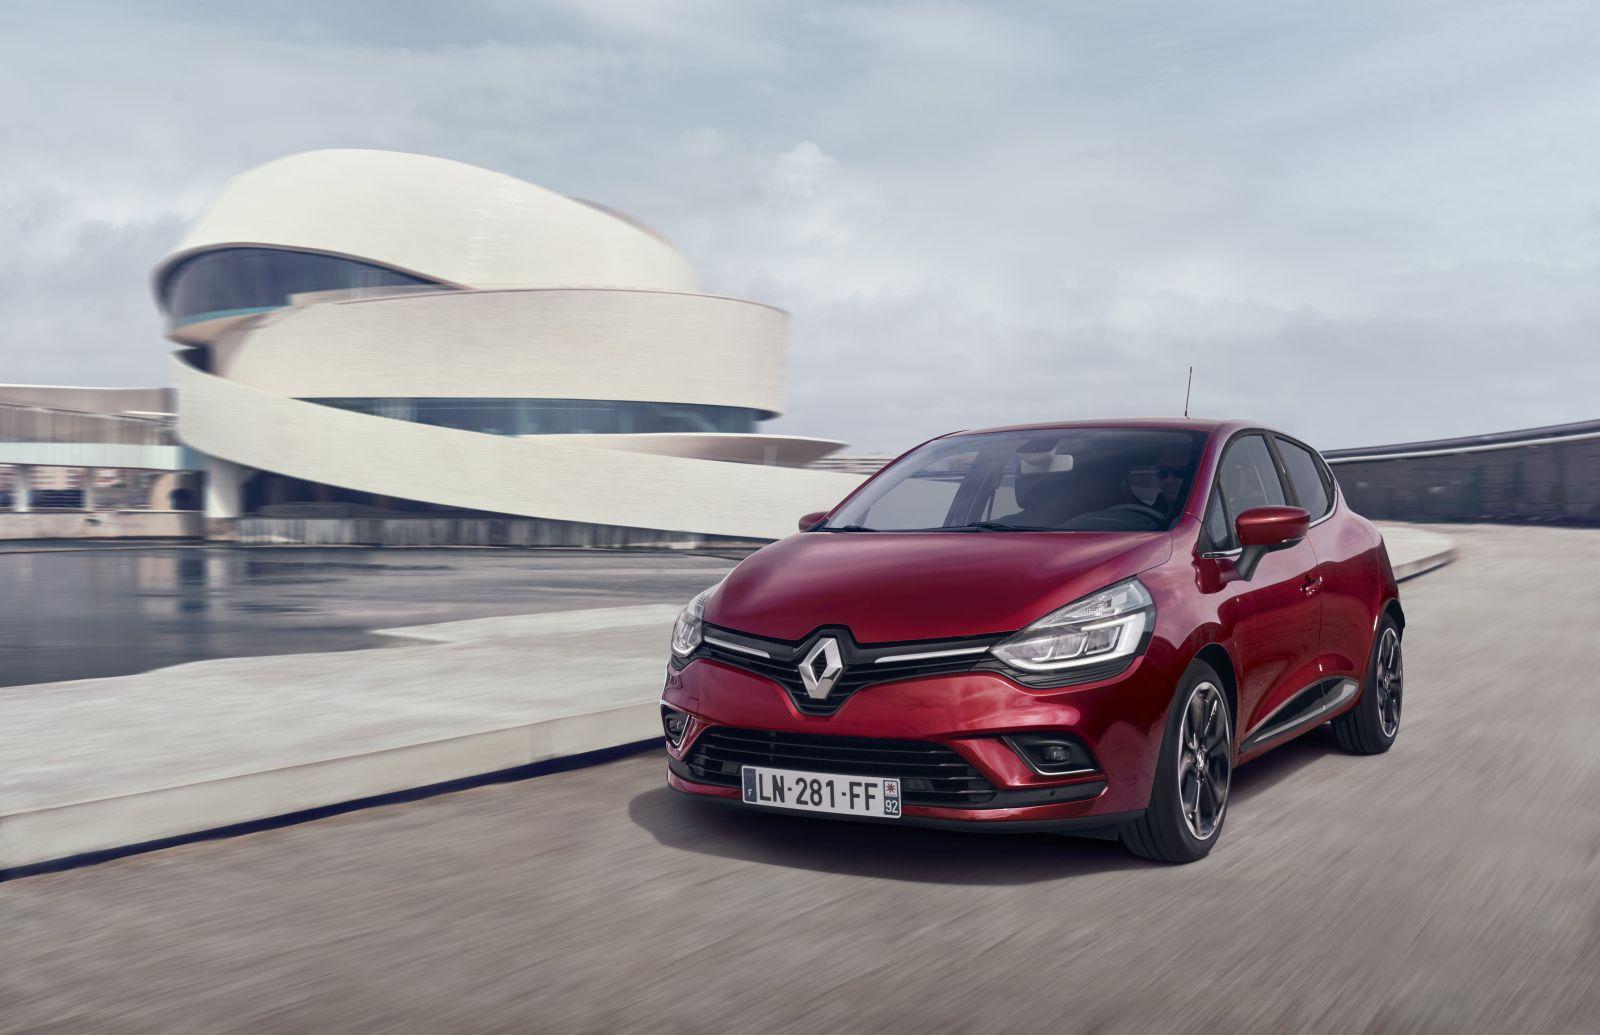 New 2017 Renault Clio (9)